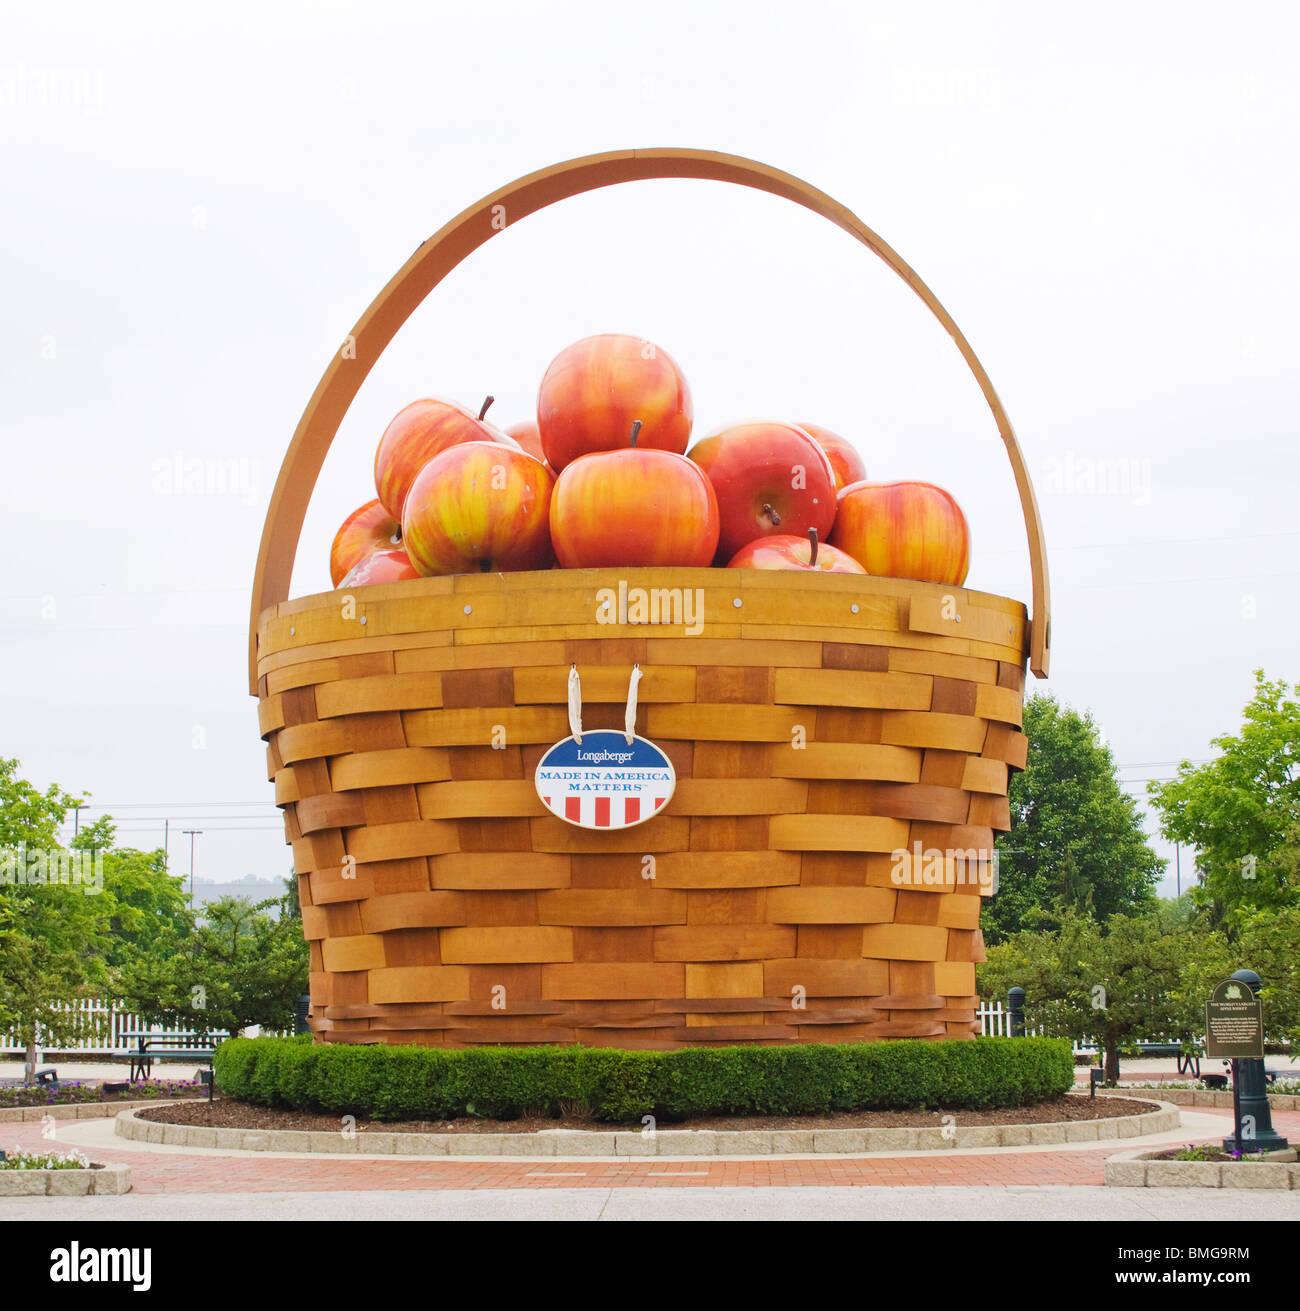 Worlds Largest Basket of Apples in Frazeysburg Ohio Stock Photo - Alamy